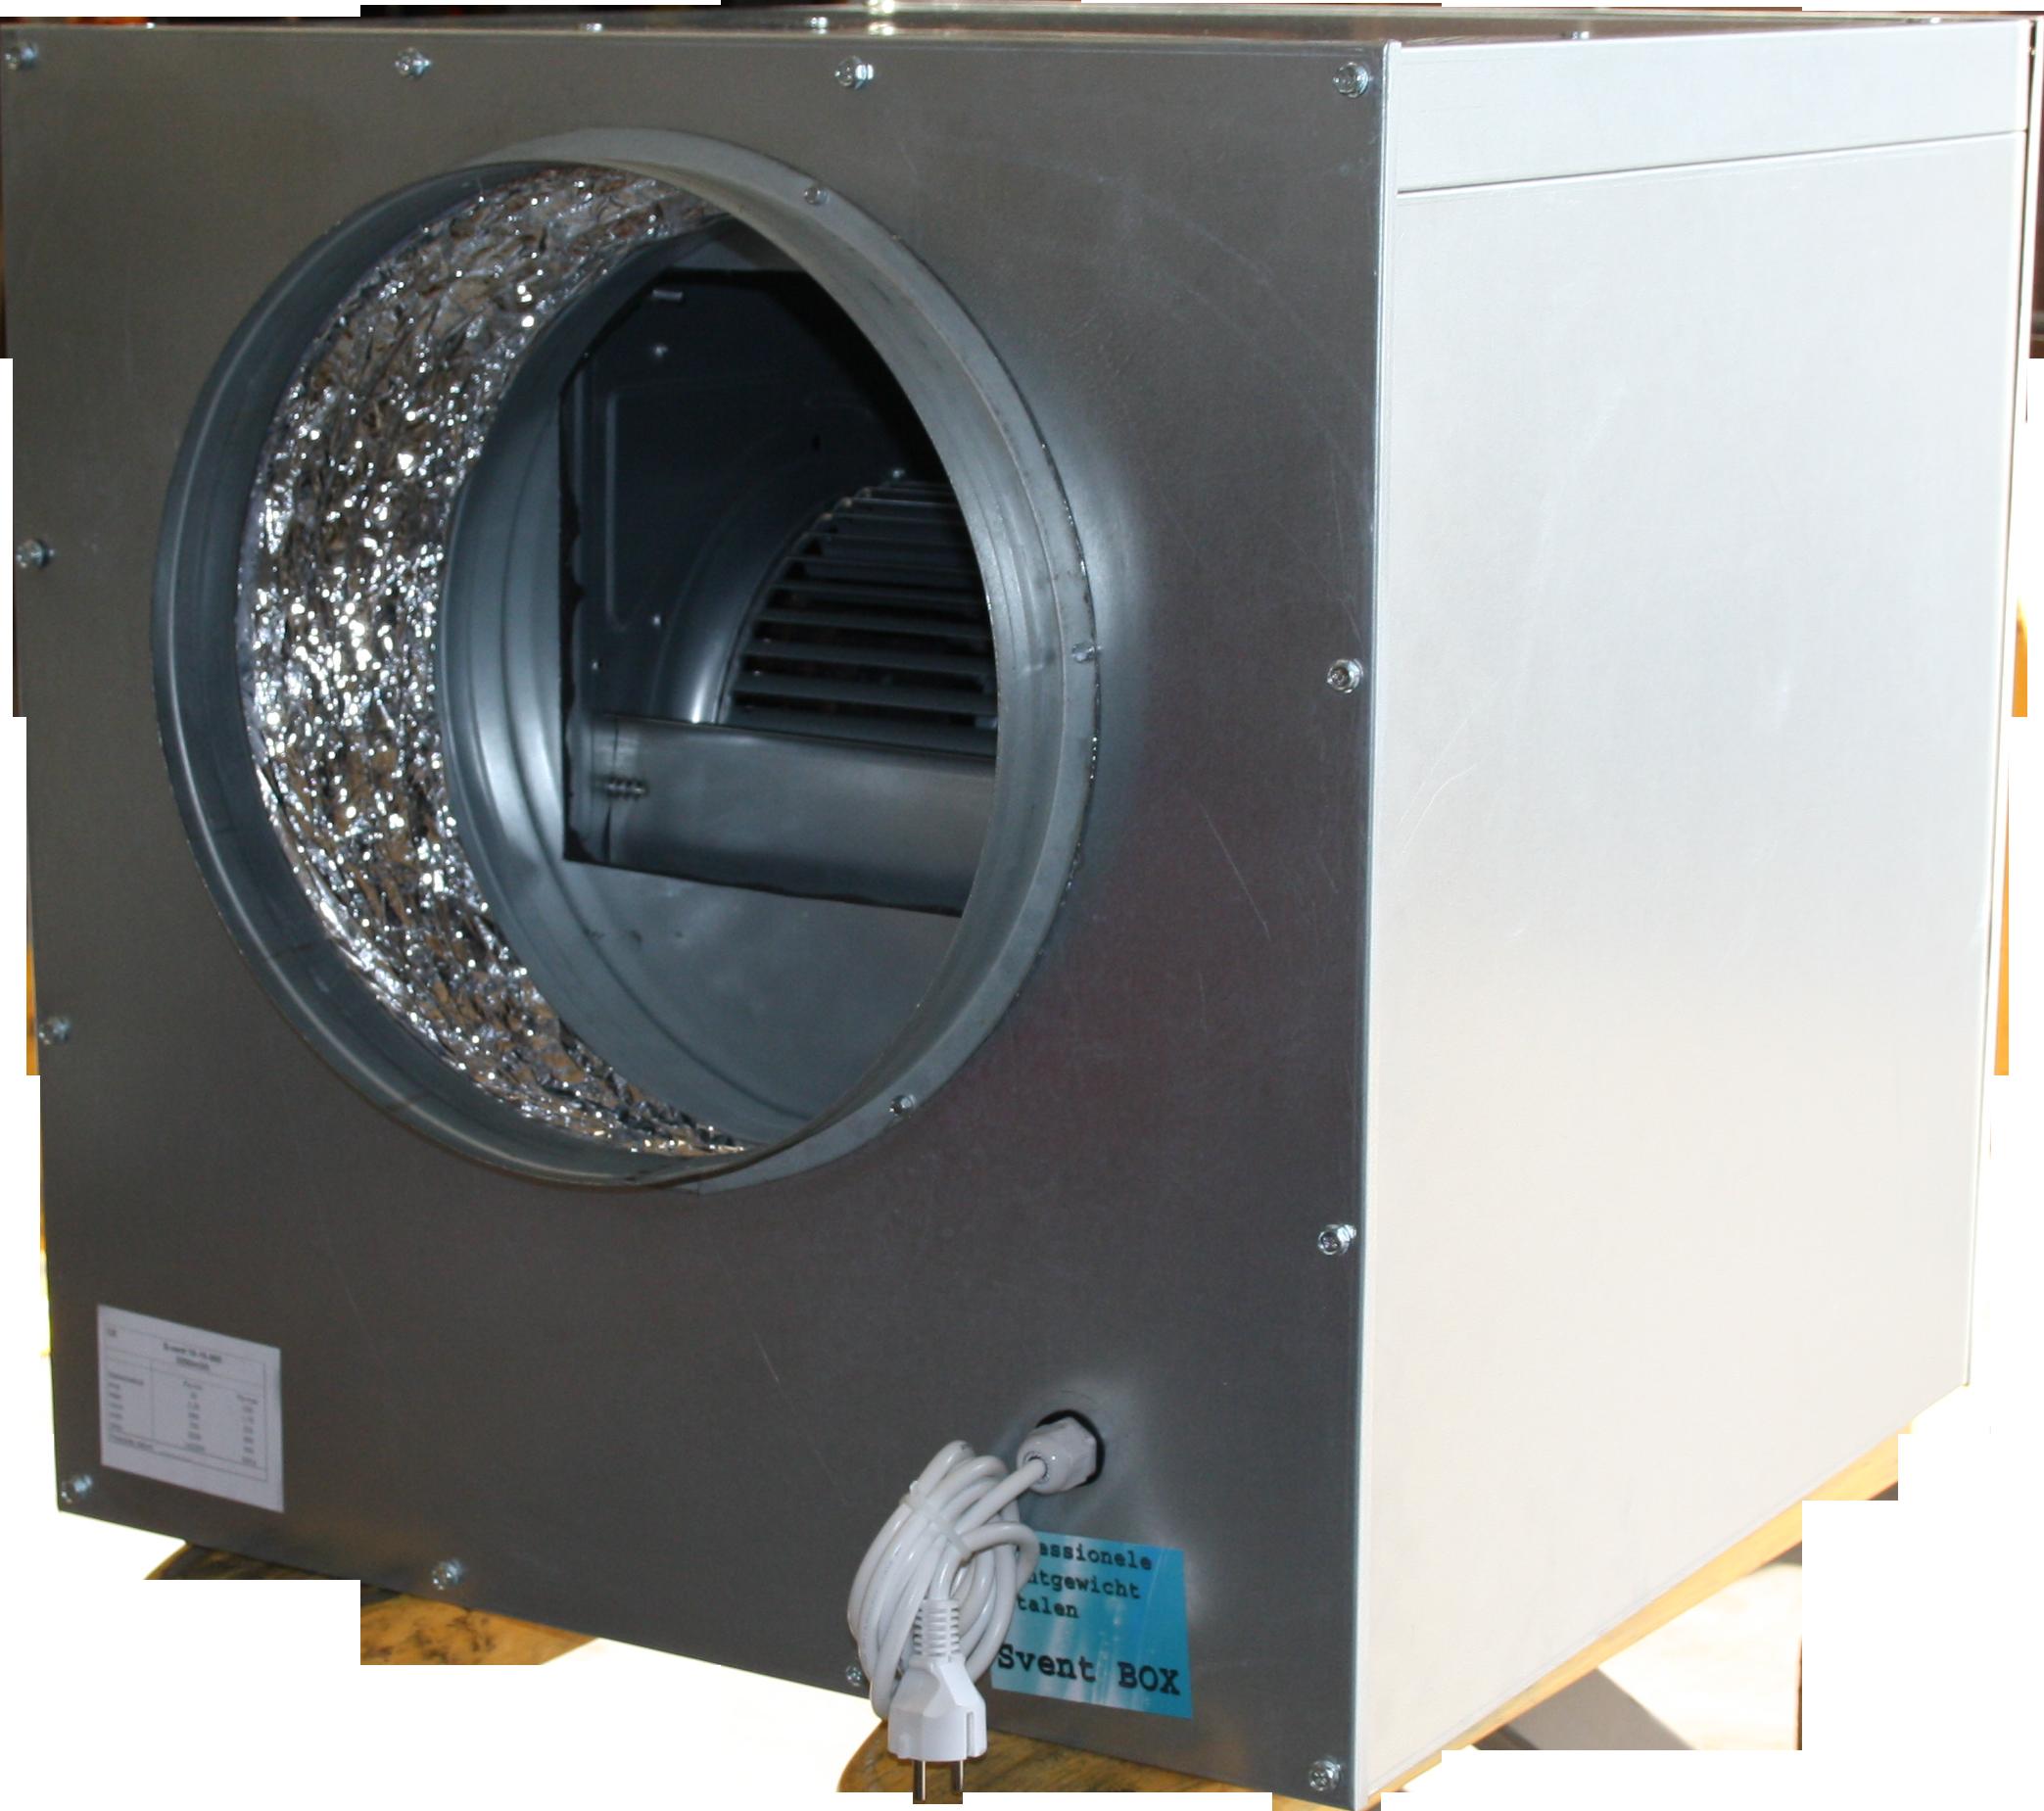 Spirototaal.nl Soft box ventilator 2000m3